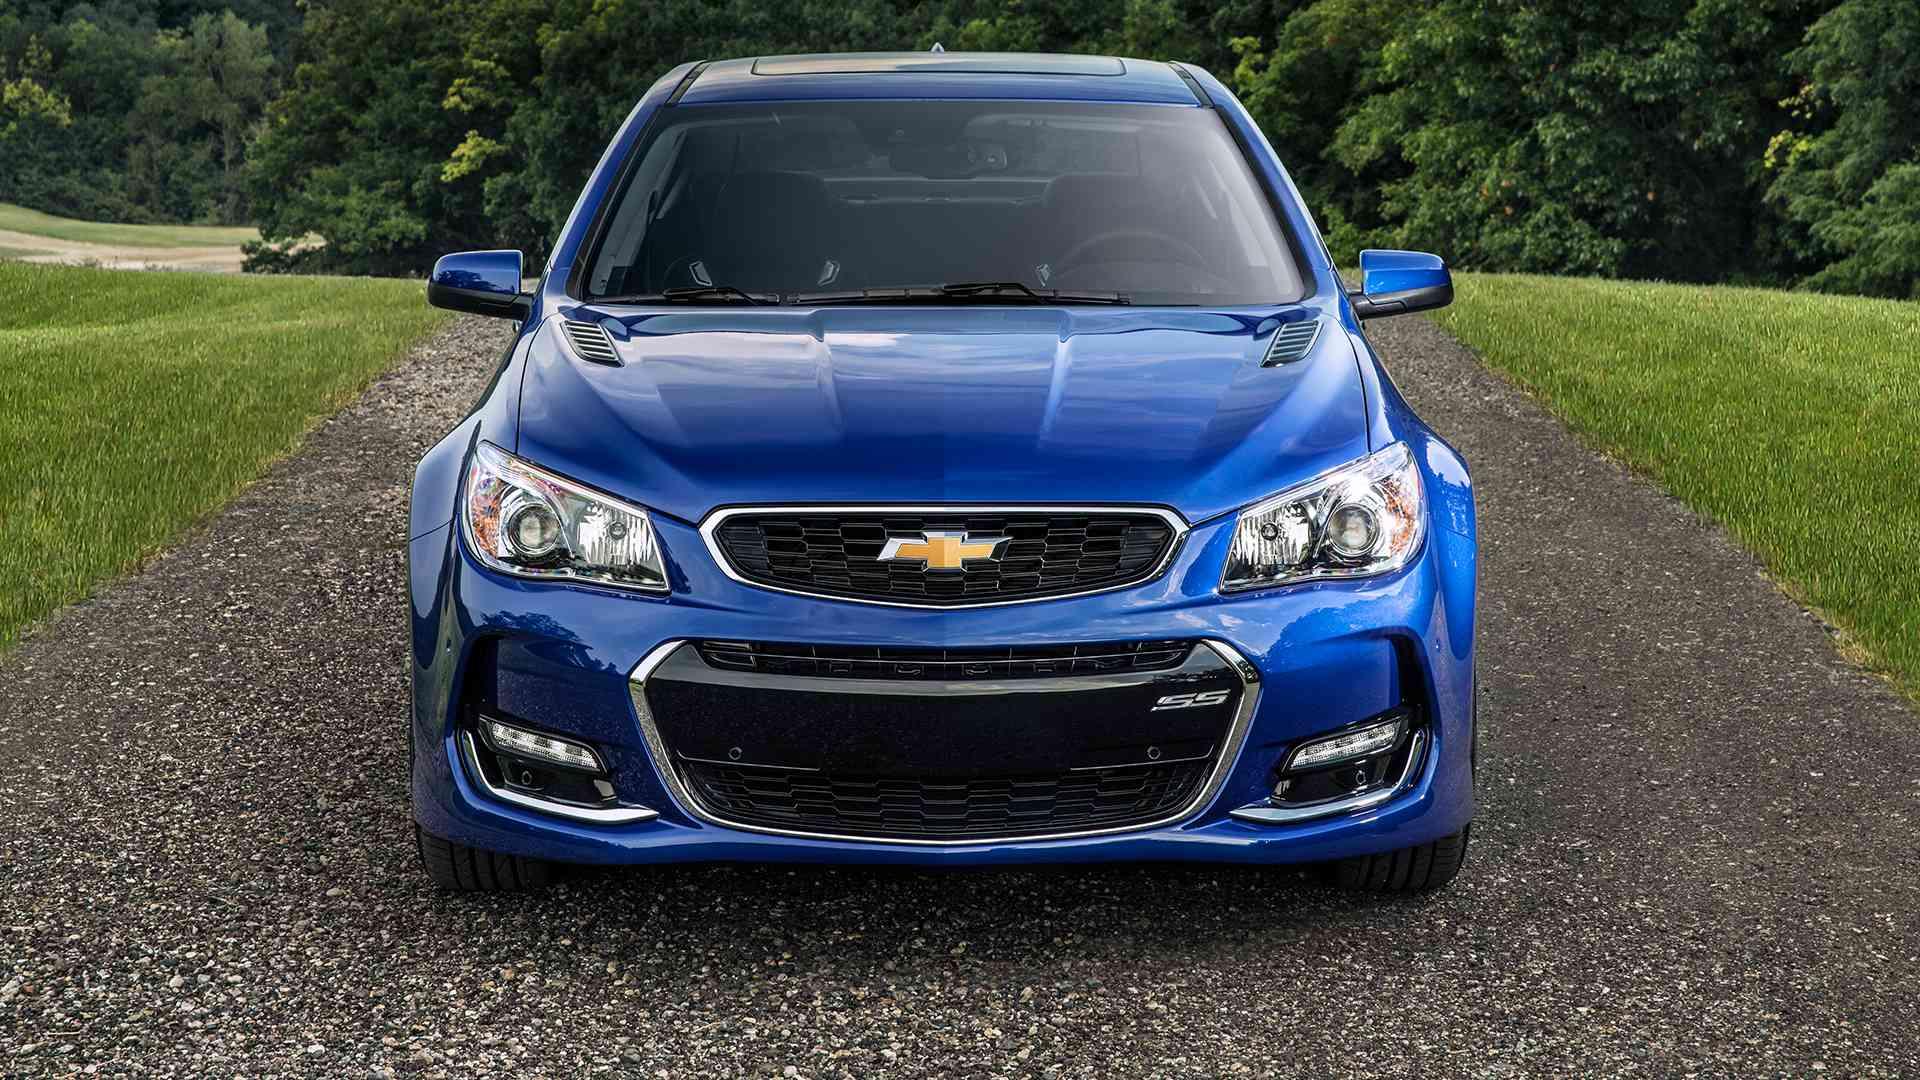 2016 Chevrolet SS Sedan Offered in Nine Exterior Colors